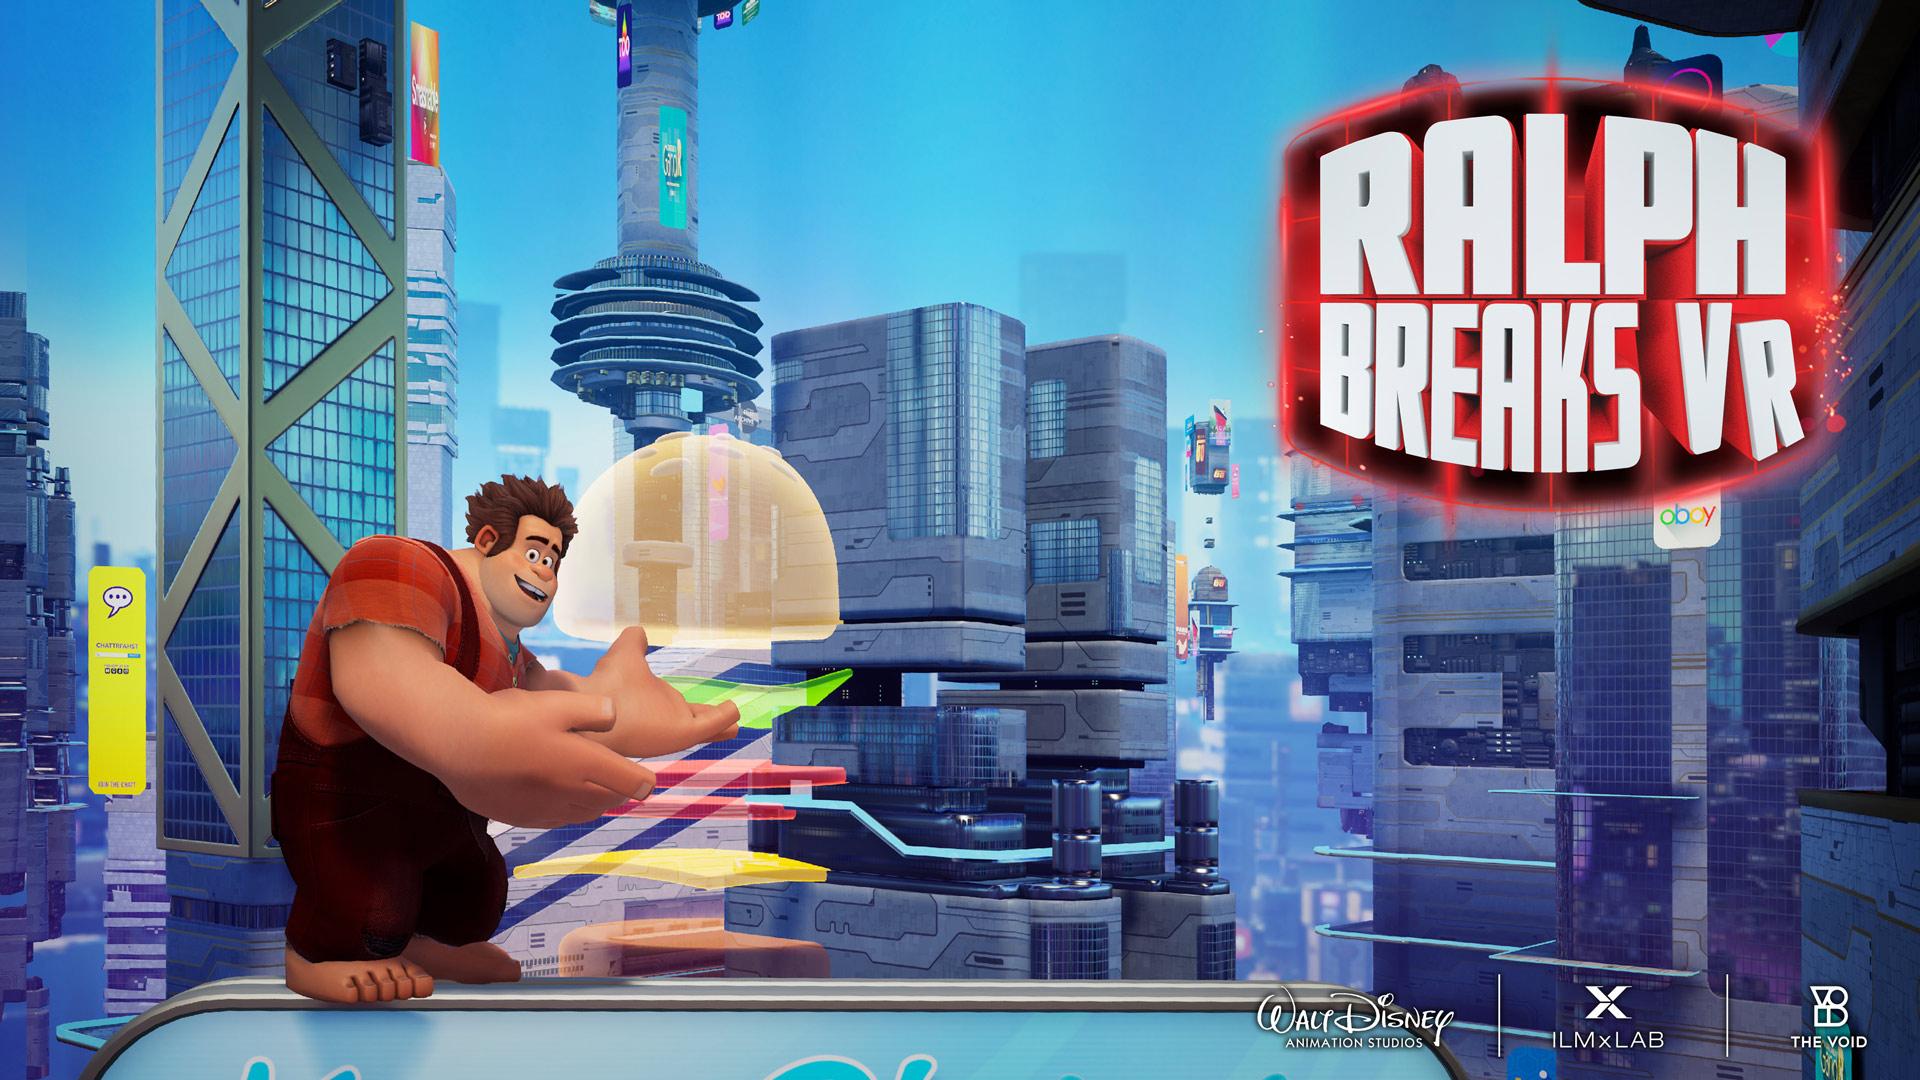 Ralph-Breaks-VR-The-Void